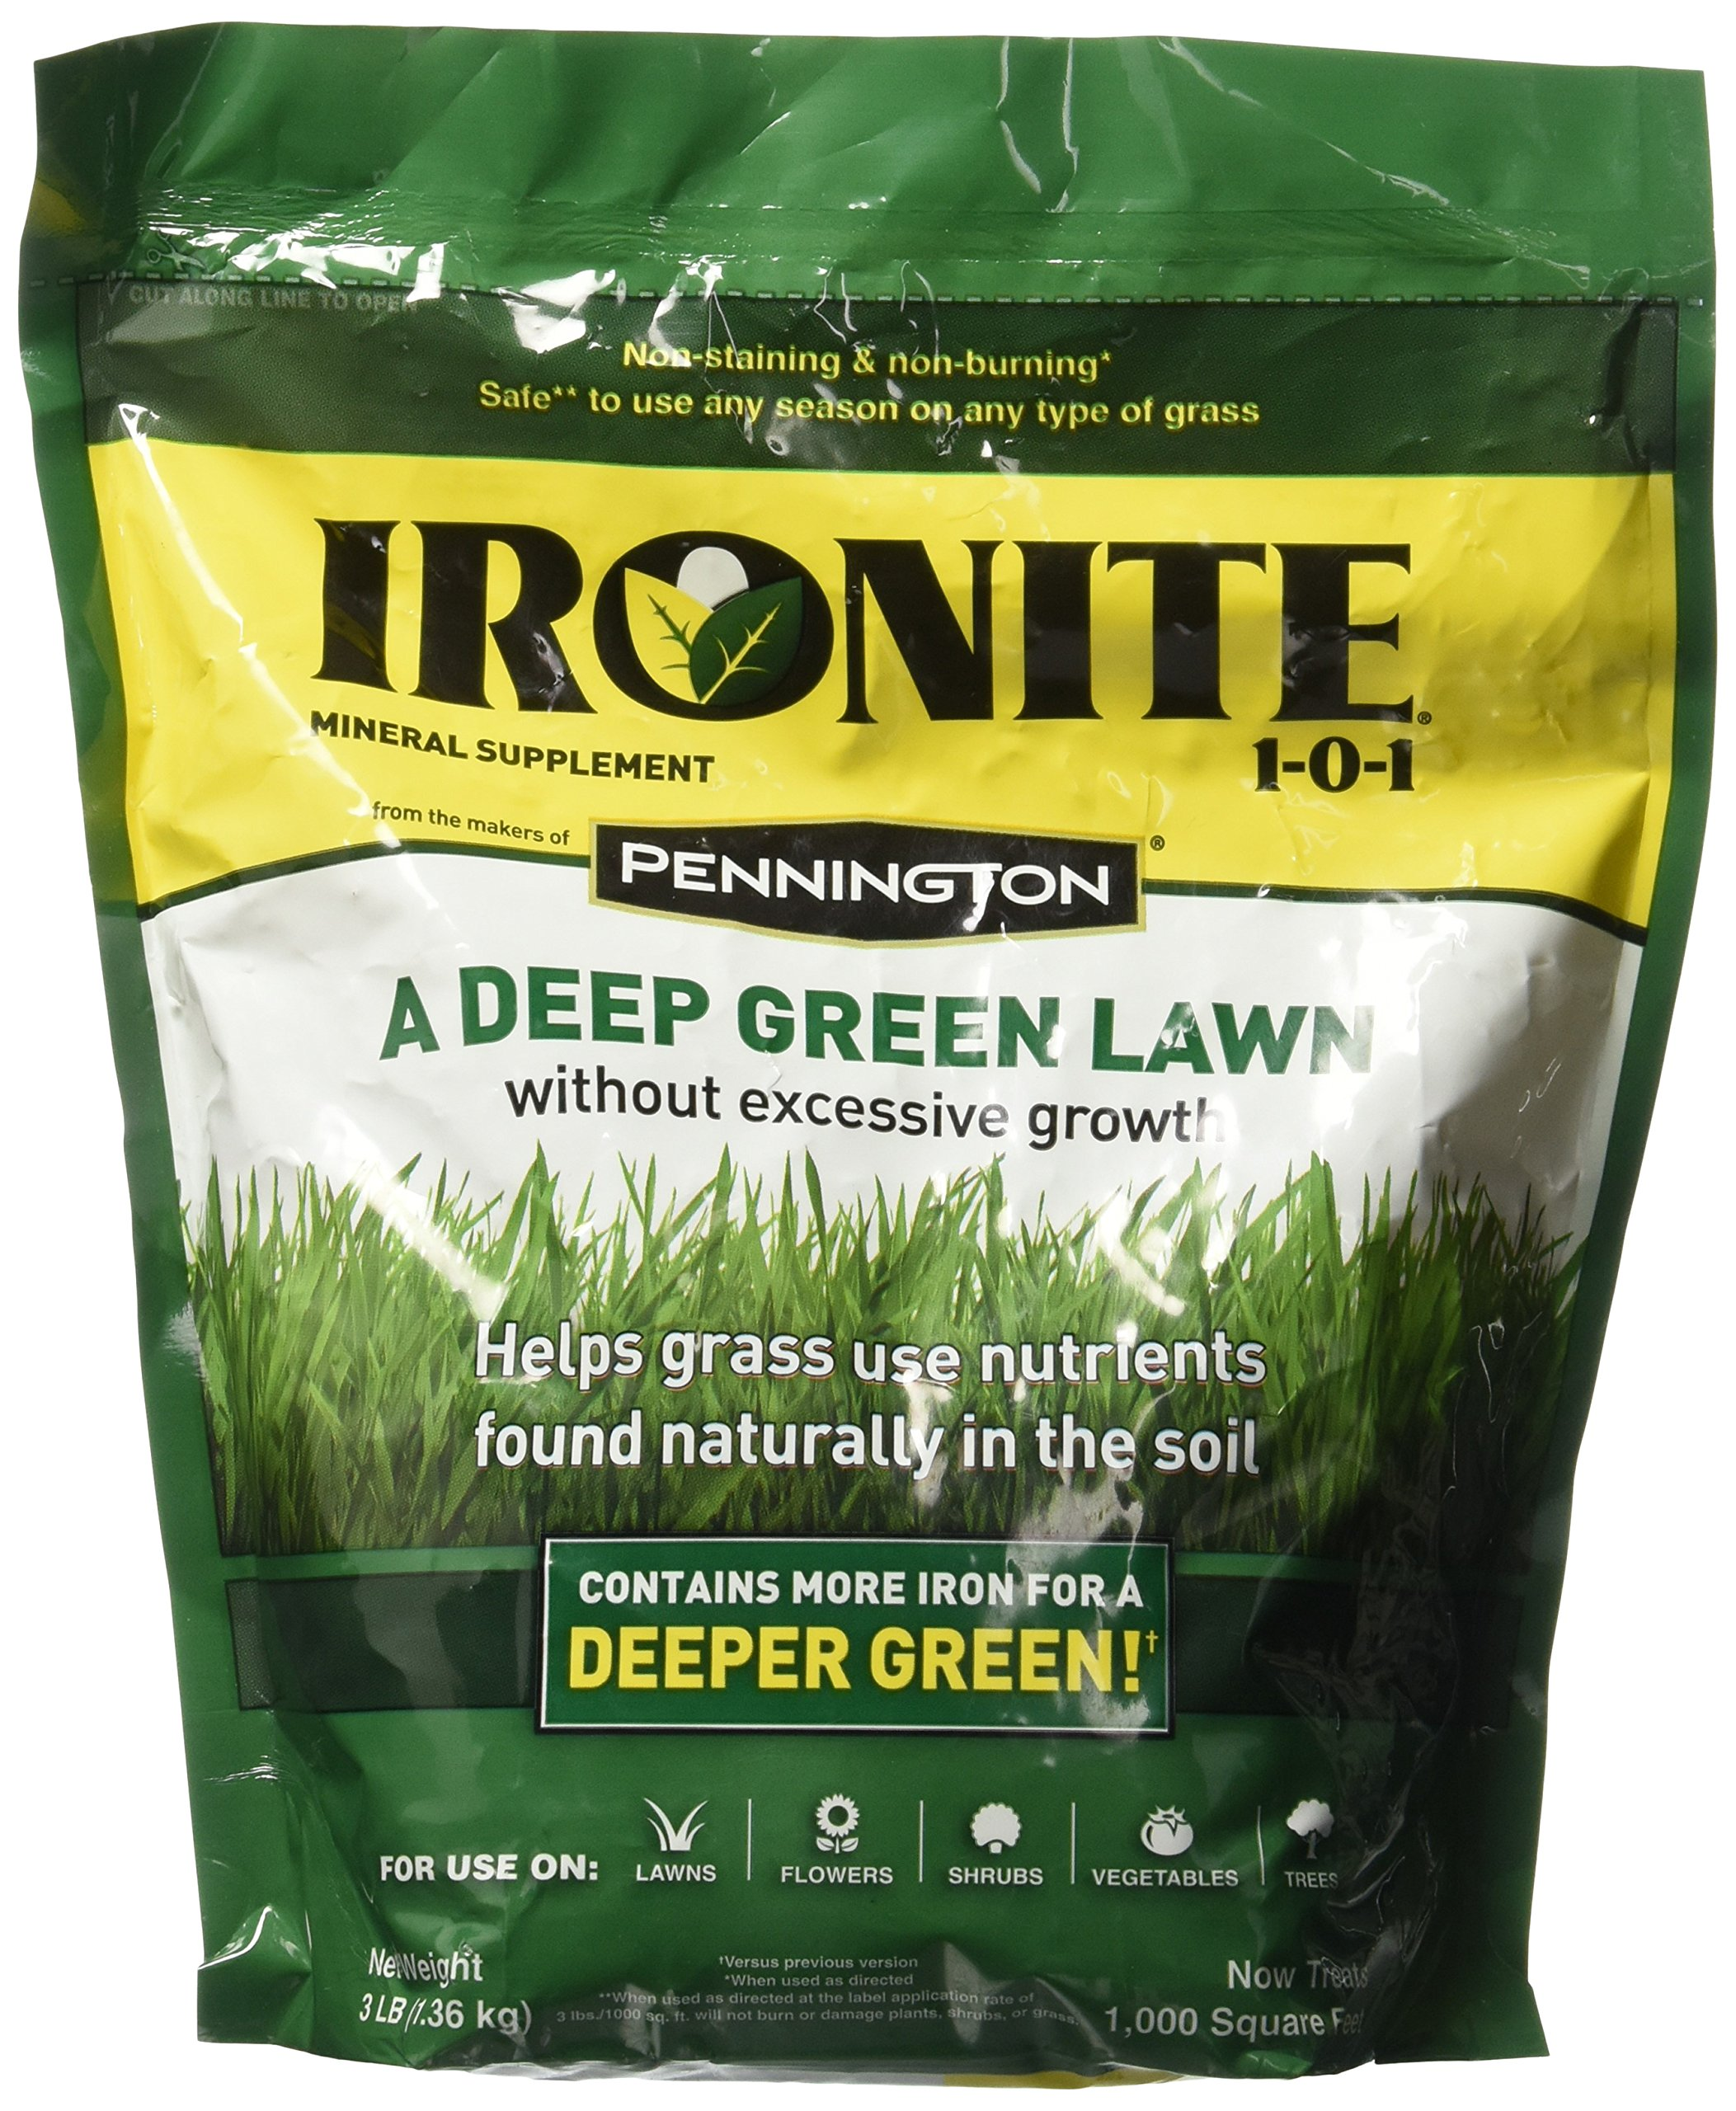 Ironite 100519429 1-0-1 Mineral Supplement/Fertilizer, 3 lb